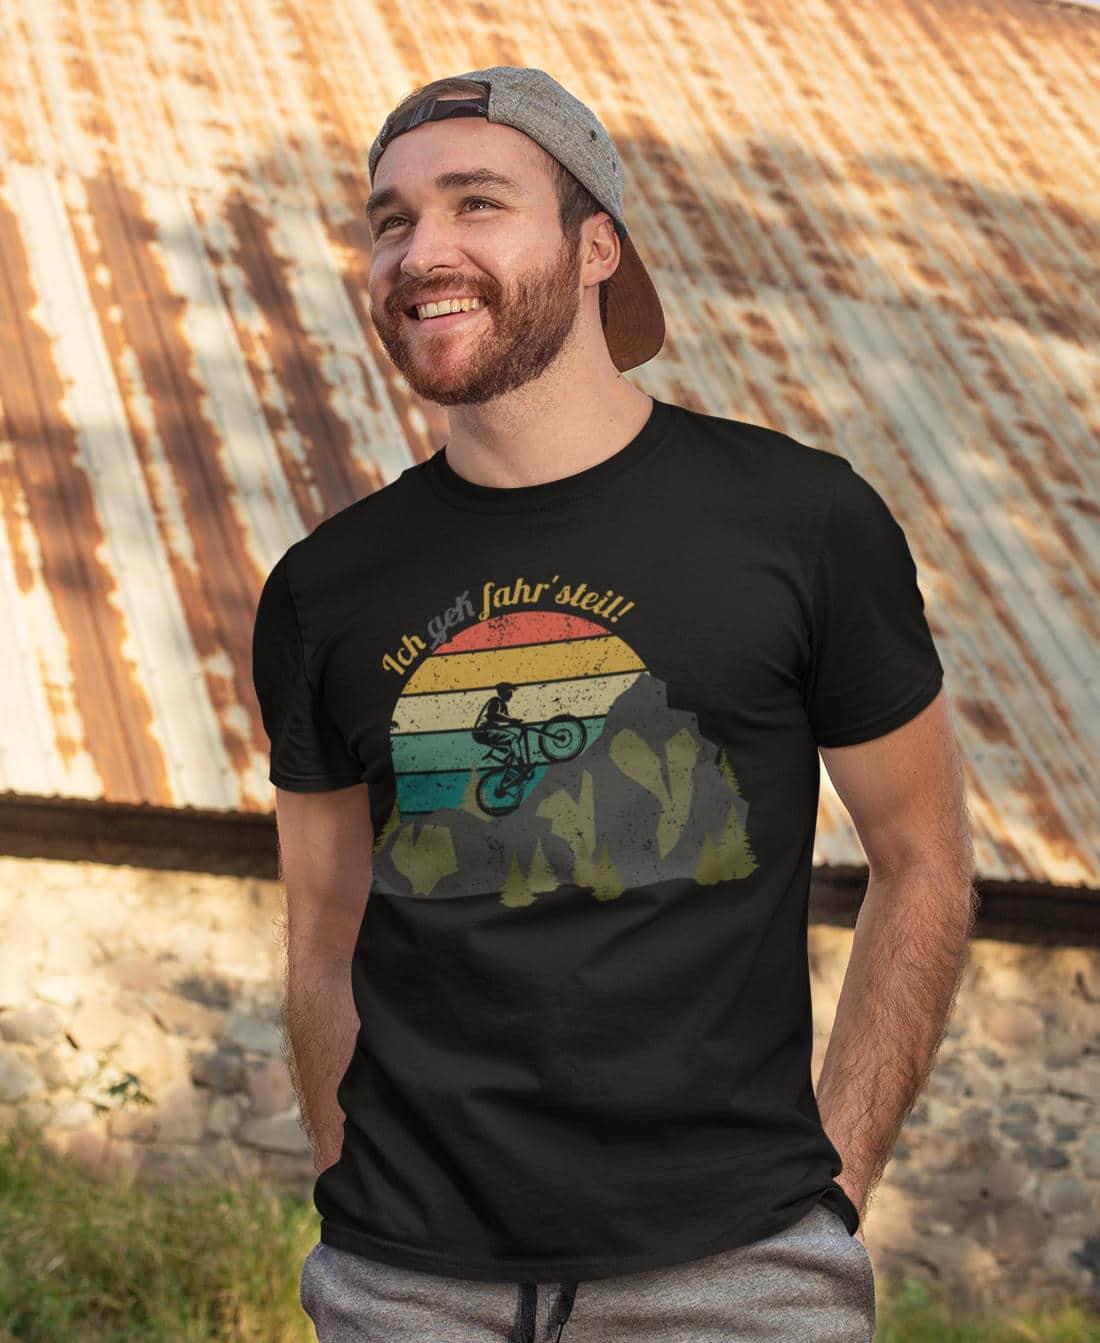 Fahrrad-T-Shirts-Ich-fahr-steil-Mountainbike